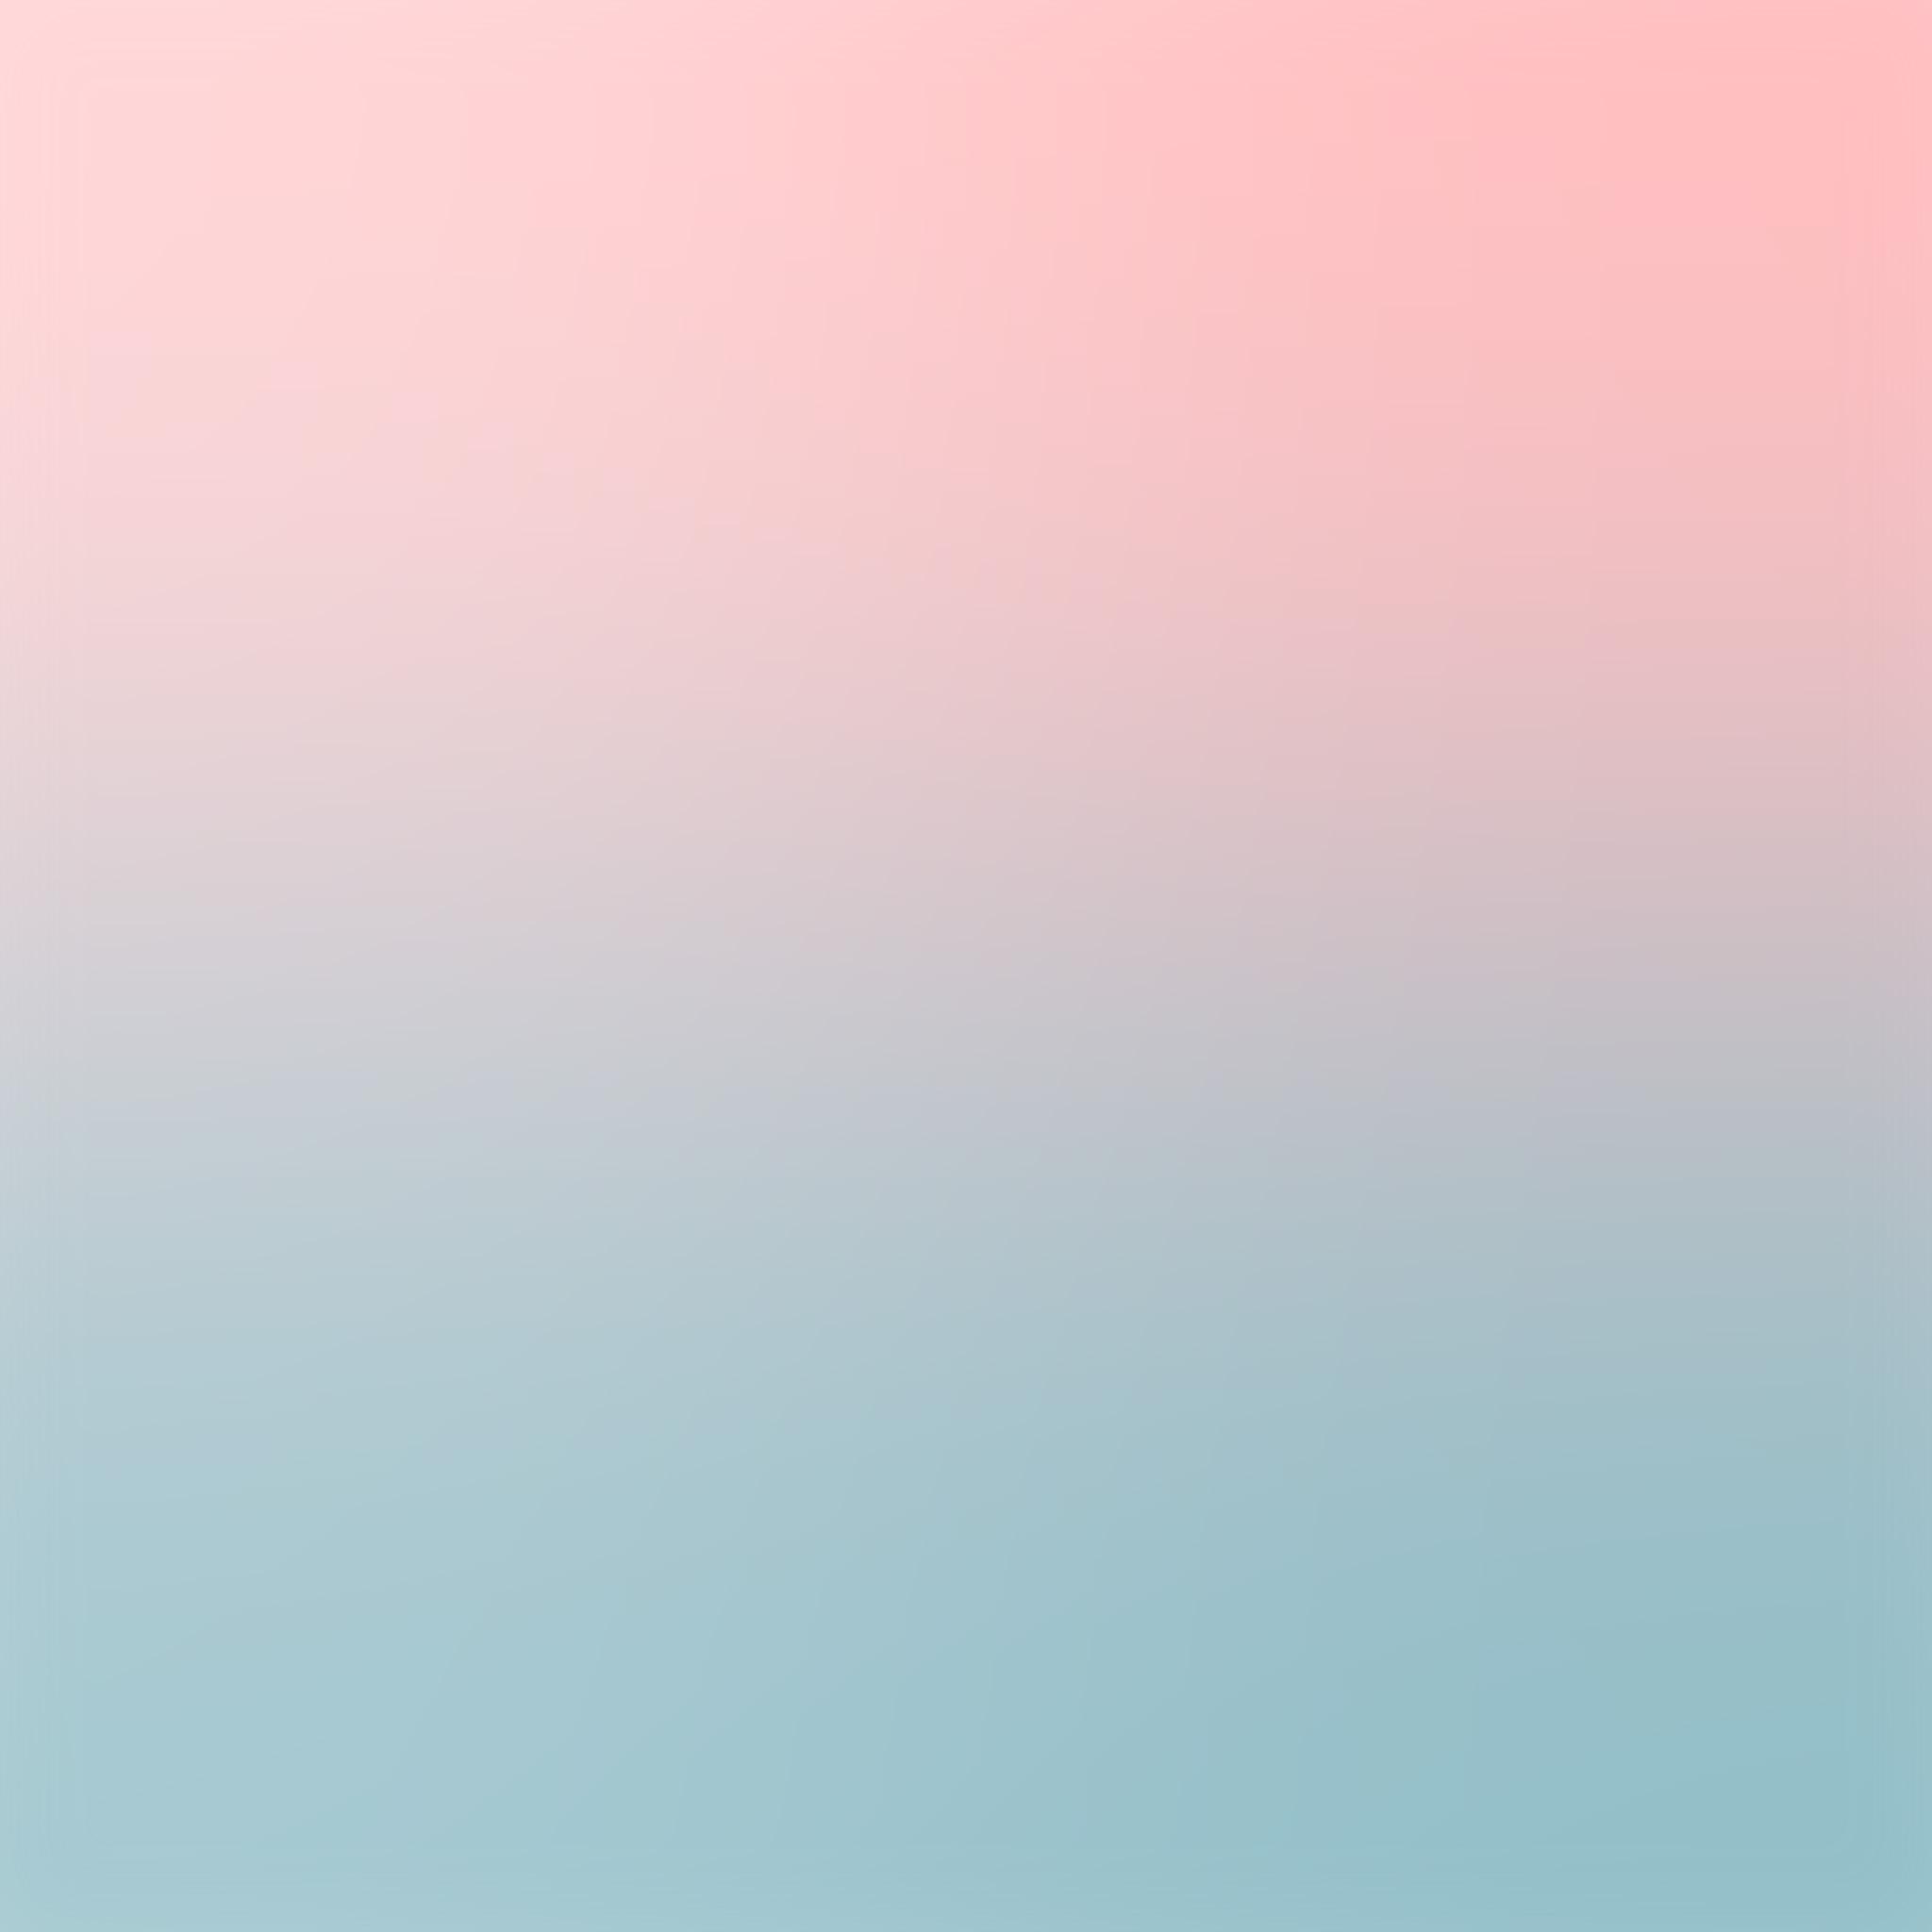 Pink Car Hd Wallpaper Sm07 Pink Blue Soft Pastel Blur Gradation Wallpaper